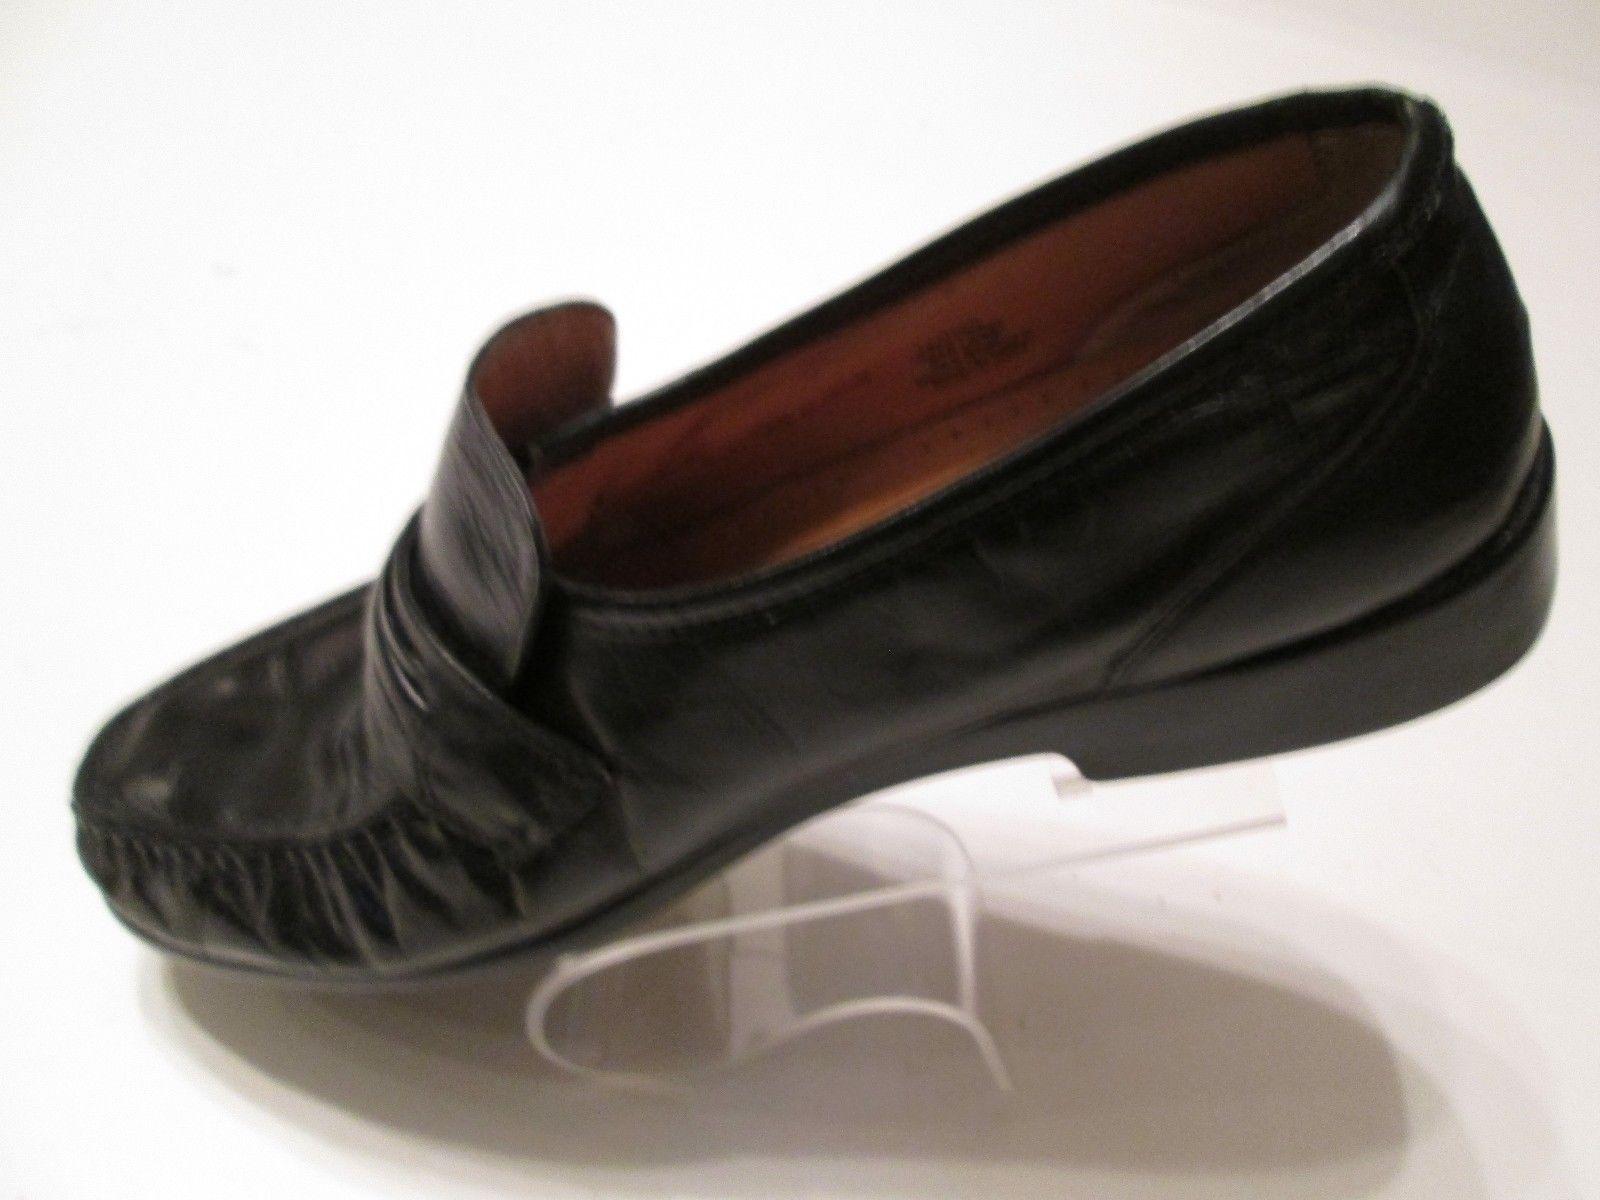 9e235c9b395f Nunn Bush Men s Loafer Size 10.5M Monk Strap Moc Toe Slip On Black Pinched  R1 -  30.99